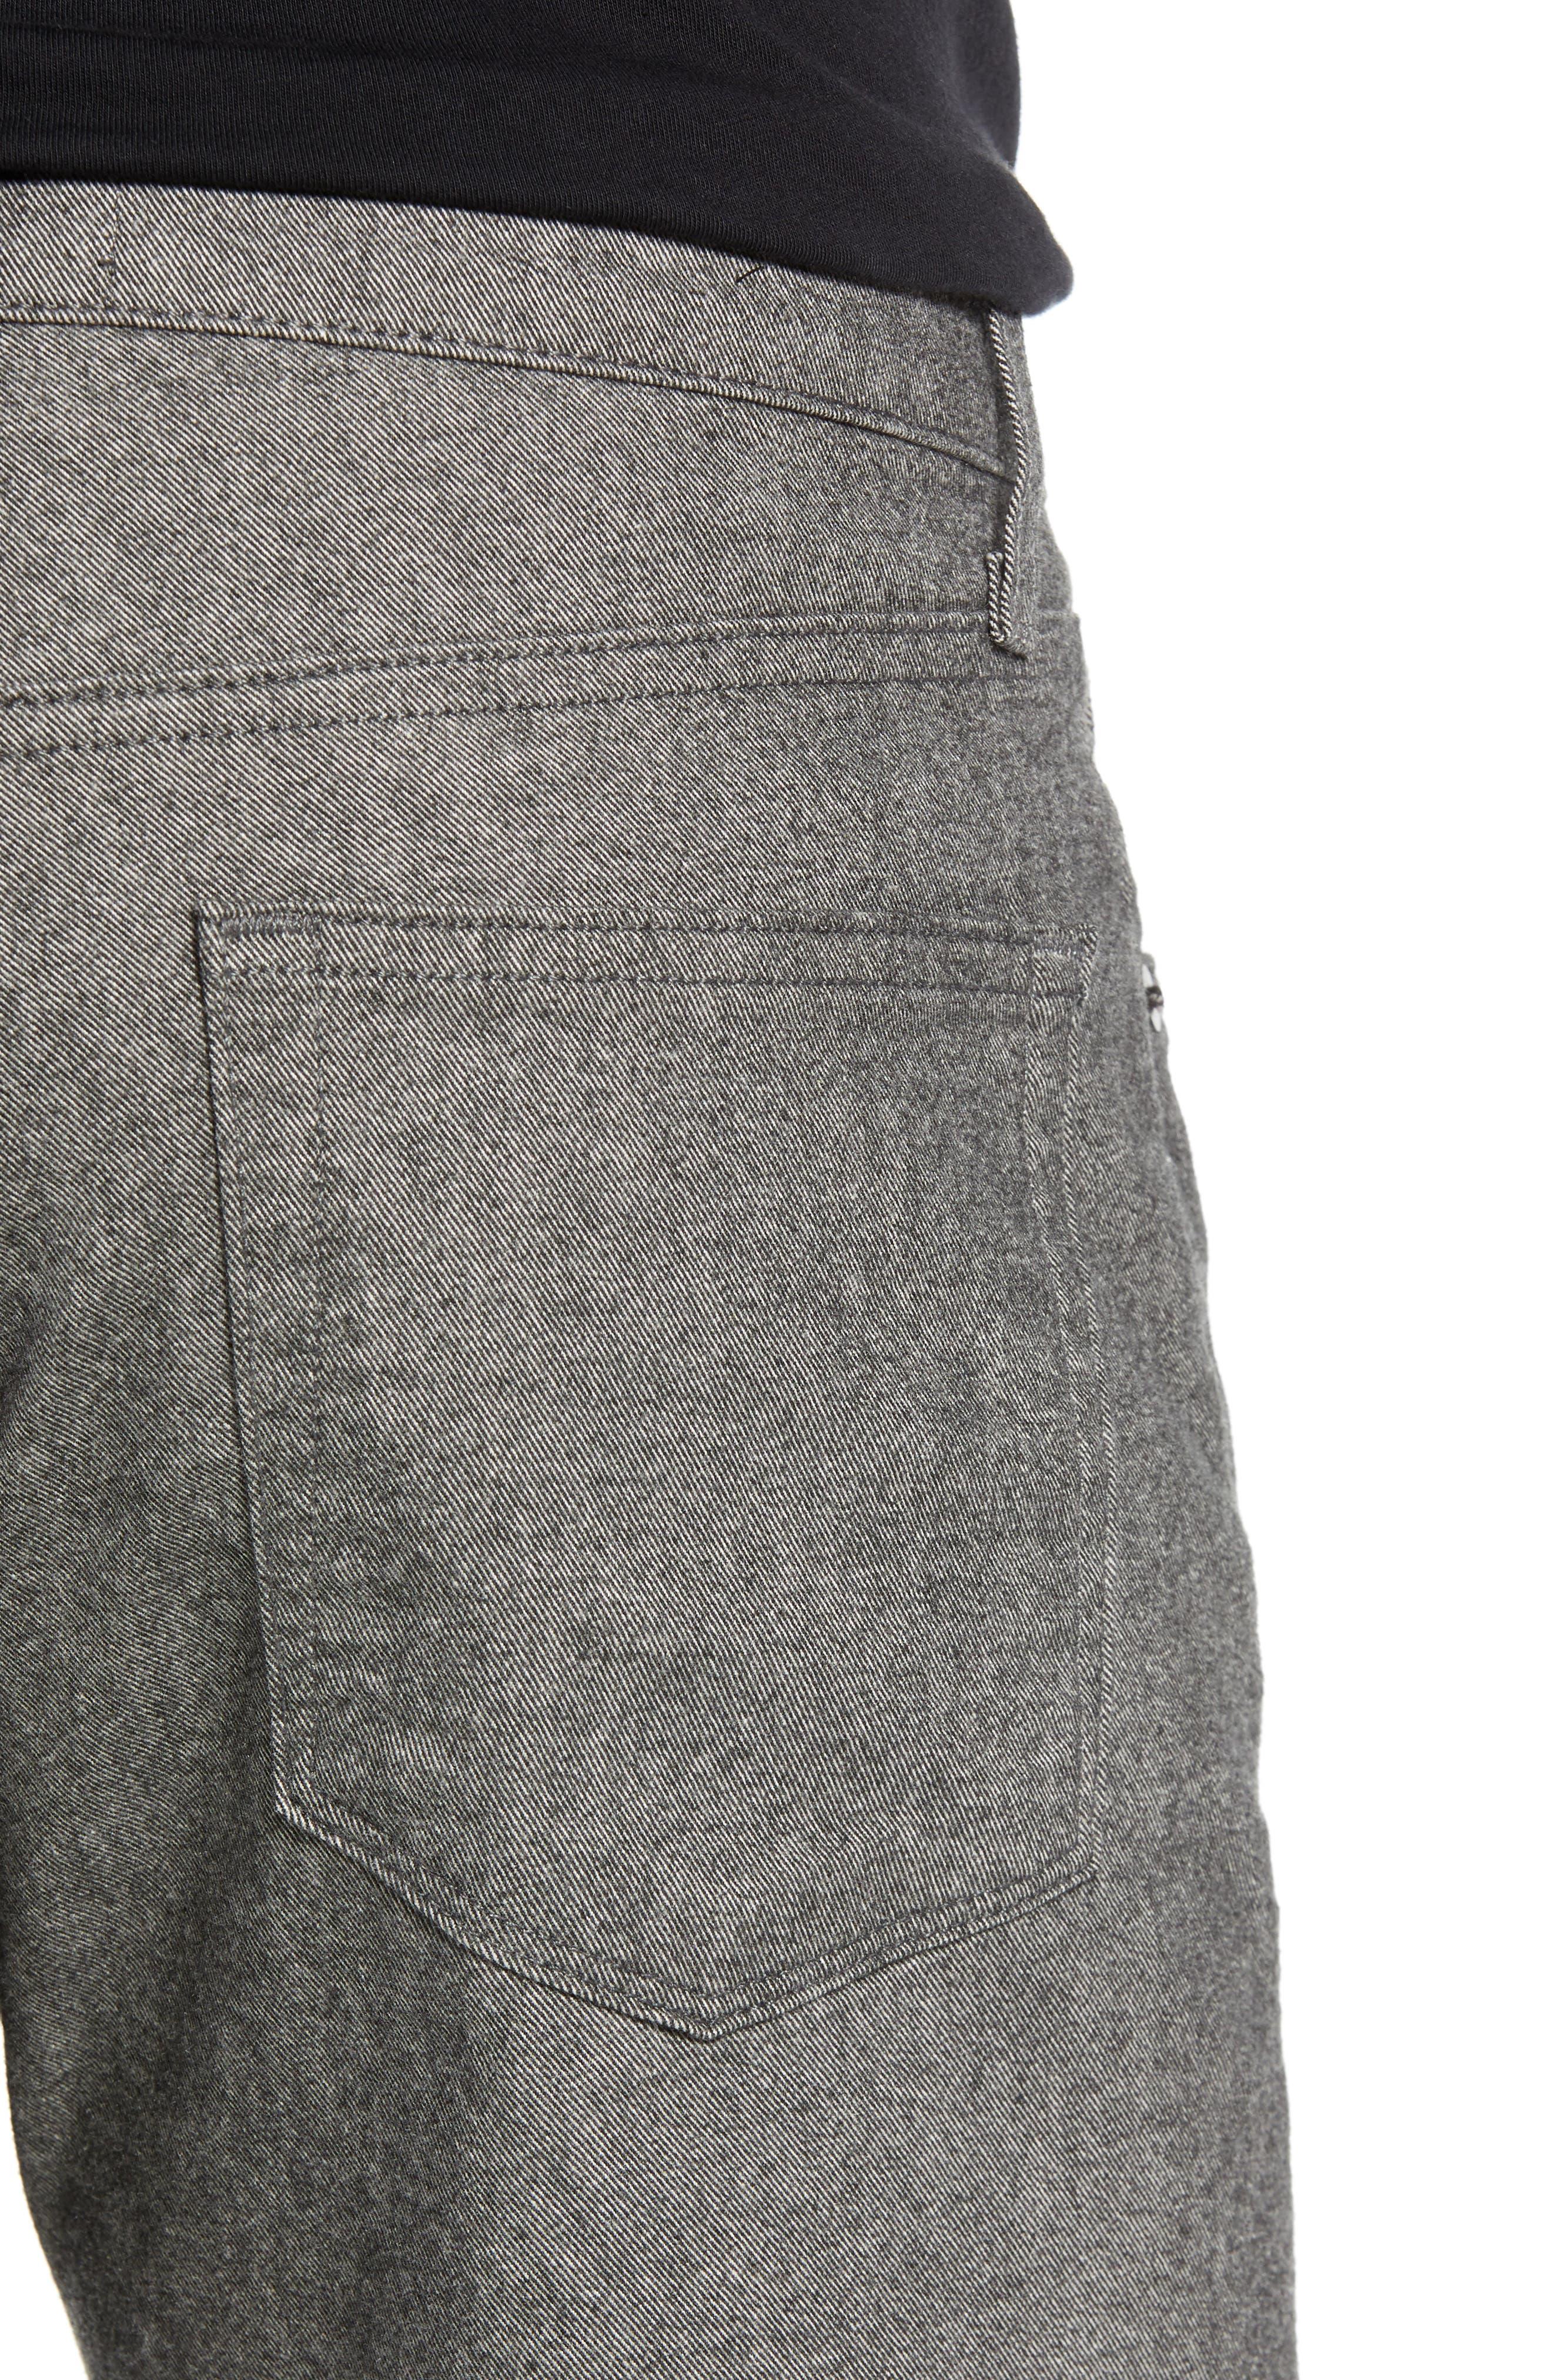 Tyler Slim Fit Jeans,                             Alternate thumbnail 4, color,                             ELECTUS MELANGE